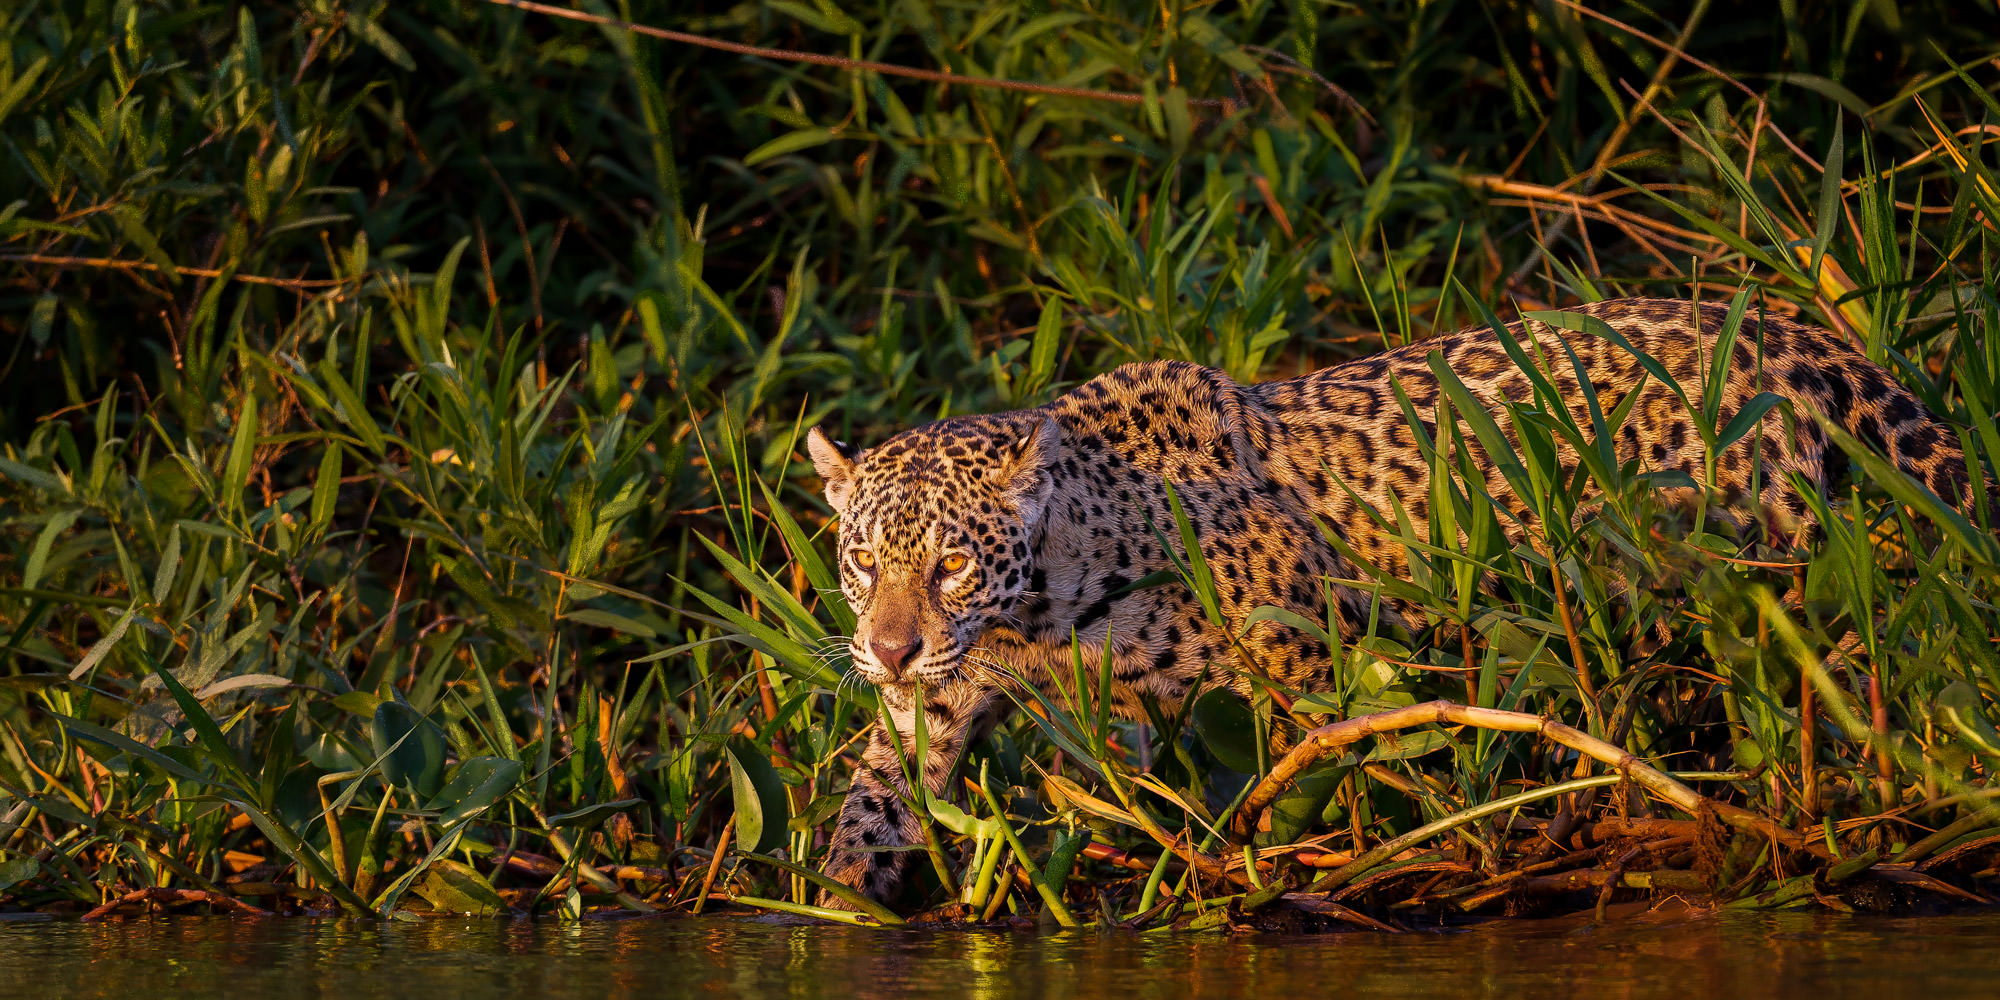 Jaguar, Brazil, Pantanal, limited edition, photograph, fine art, wildlife, photo